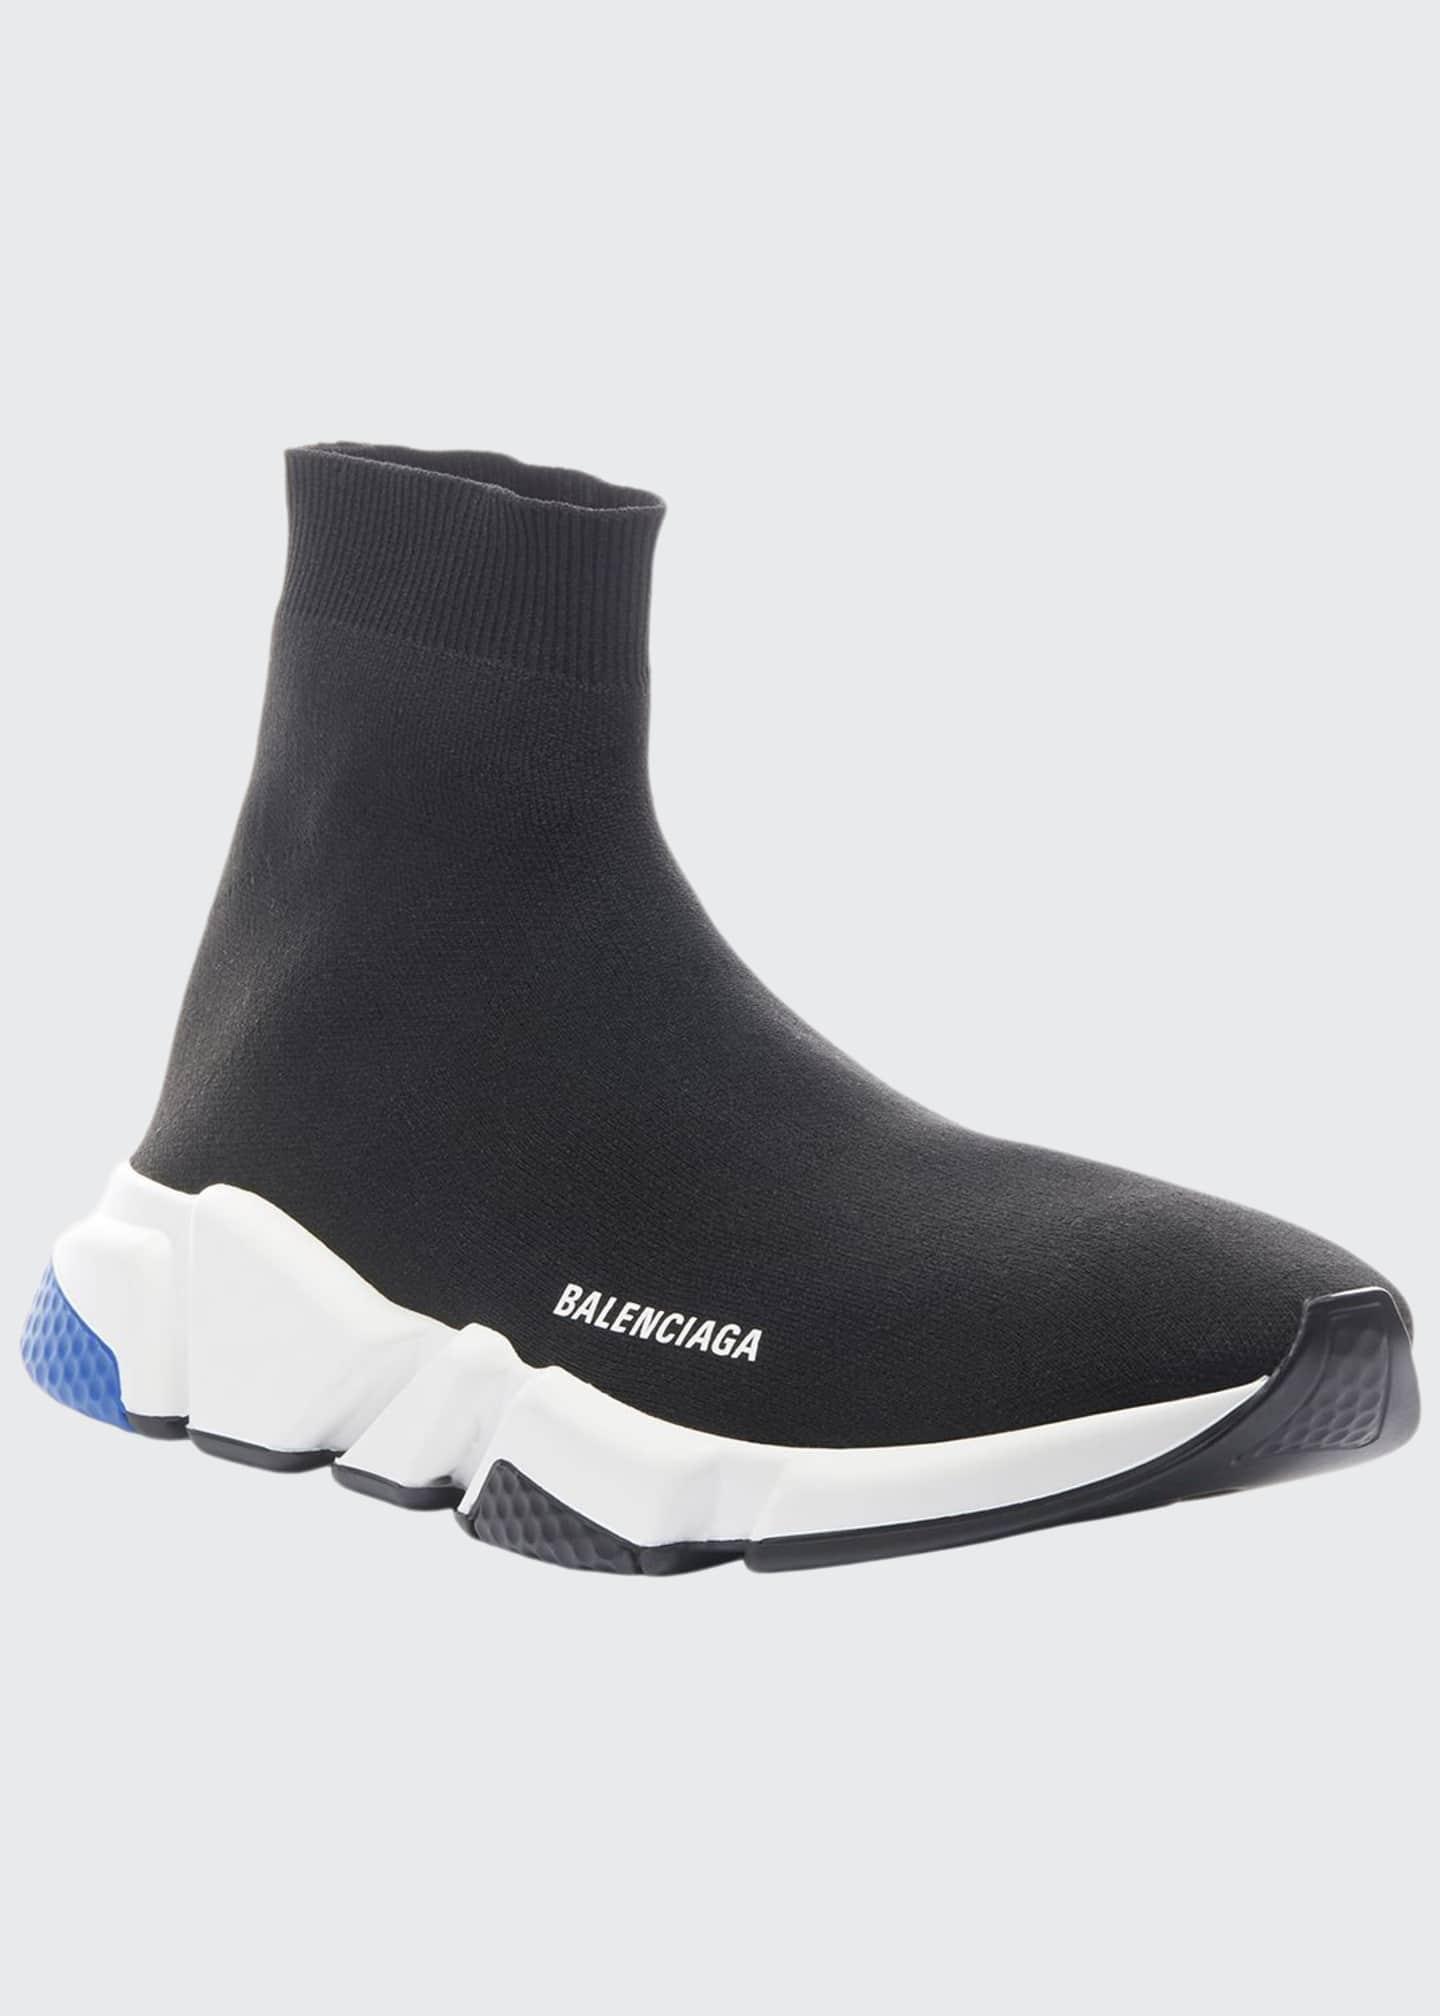 Balenciaga Men's Speed Knit High-Top Sock Sneakers